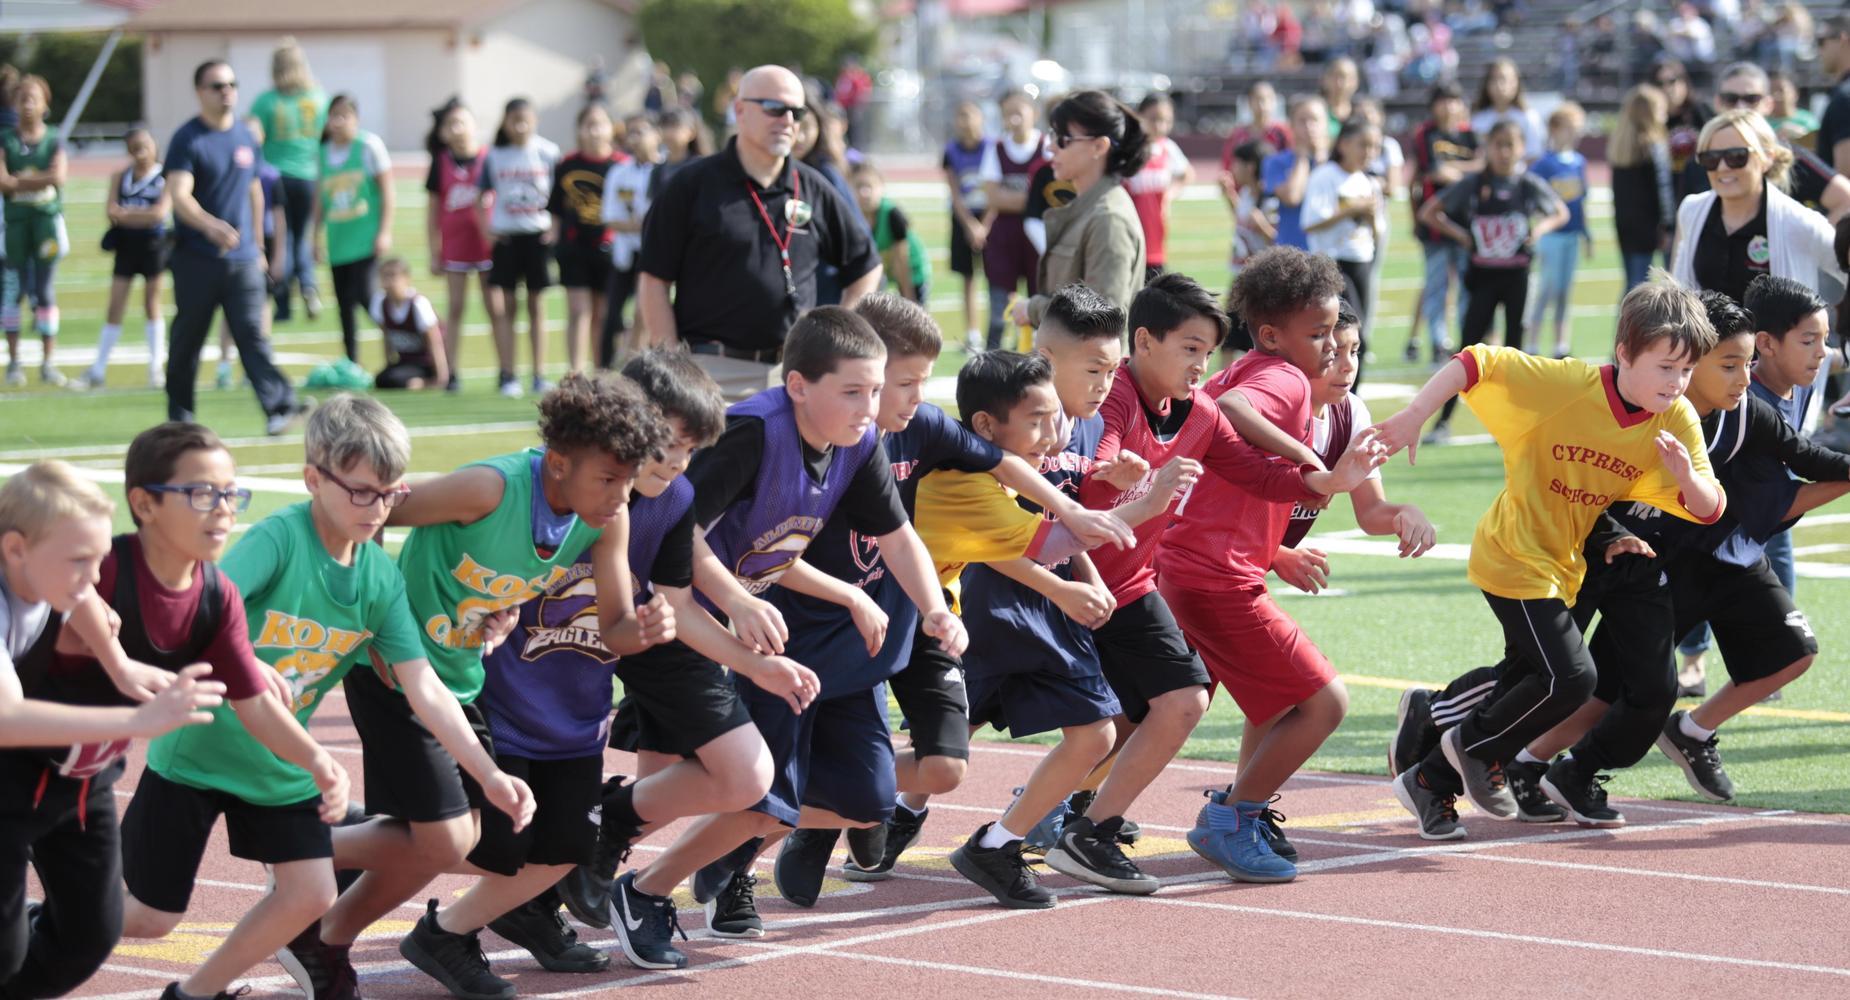 Kids running at the beginning of a race